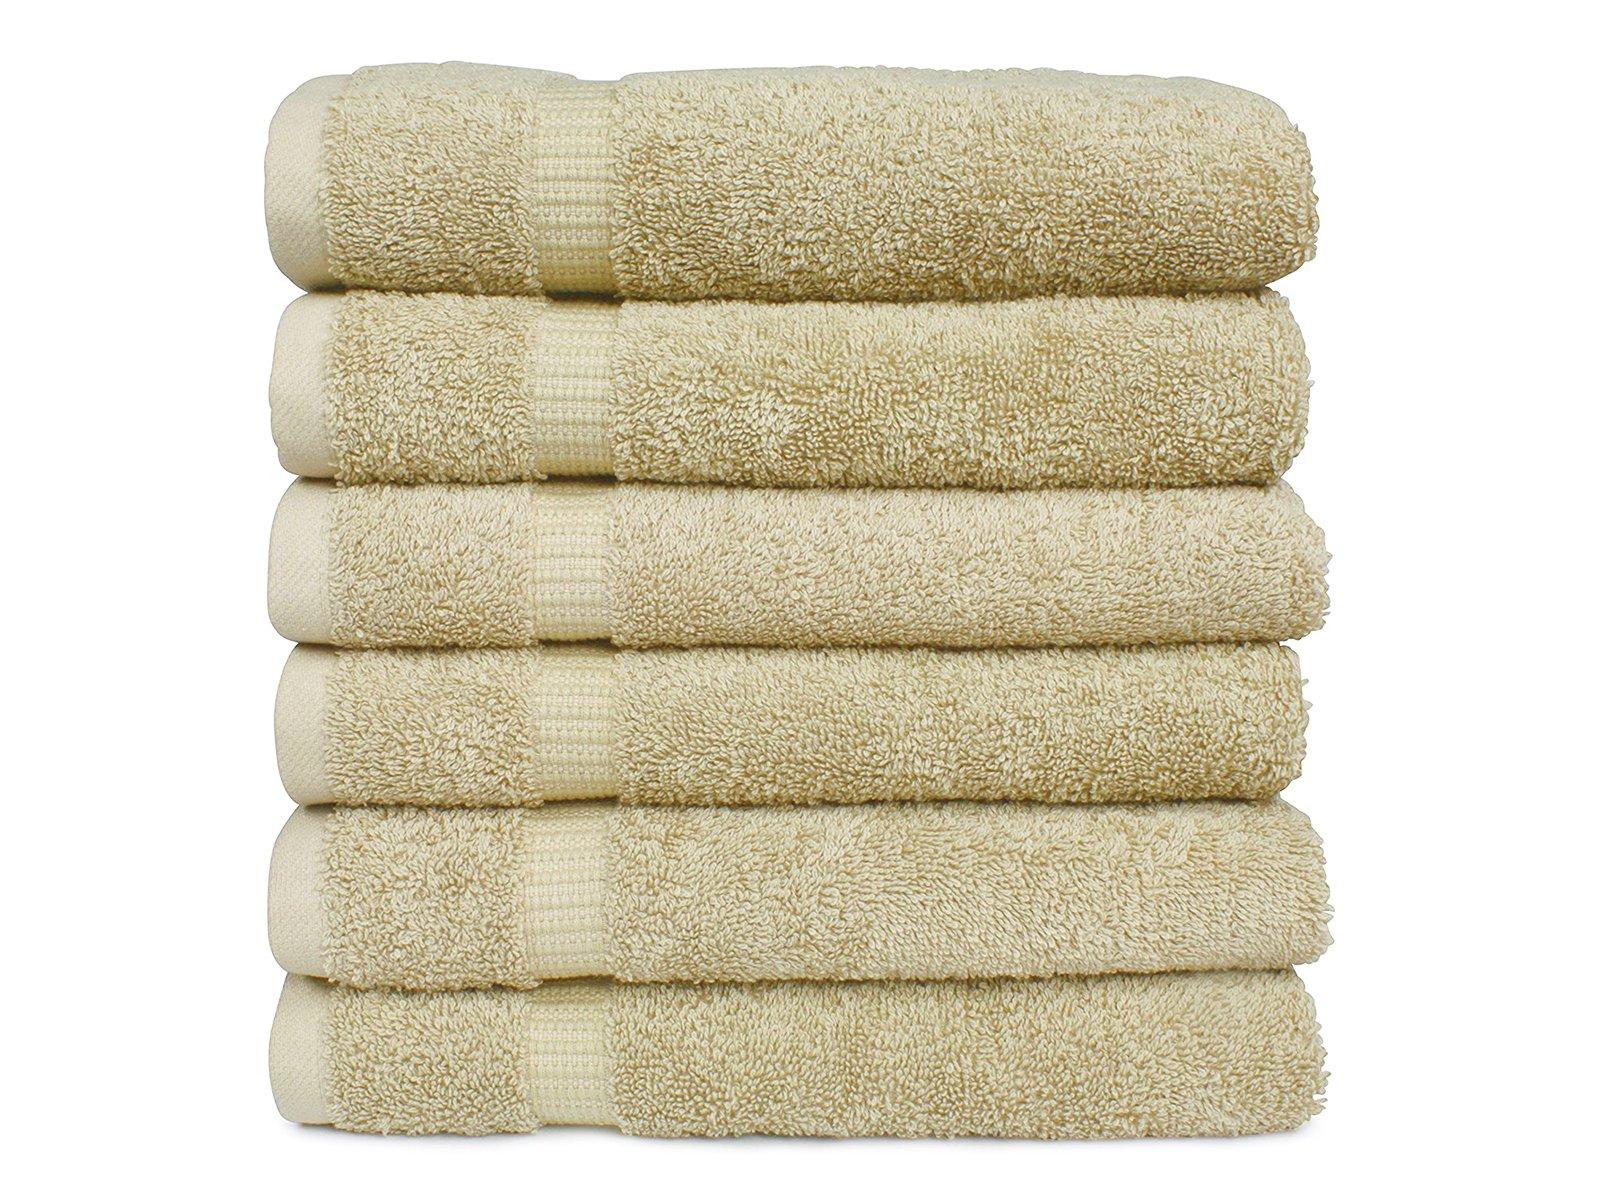 [NEW] PLS Home Premium Towels 700 GSM, 6-Pack Hand Towels, Towel Set, Beige